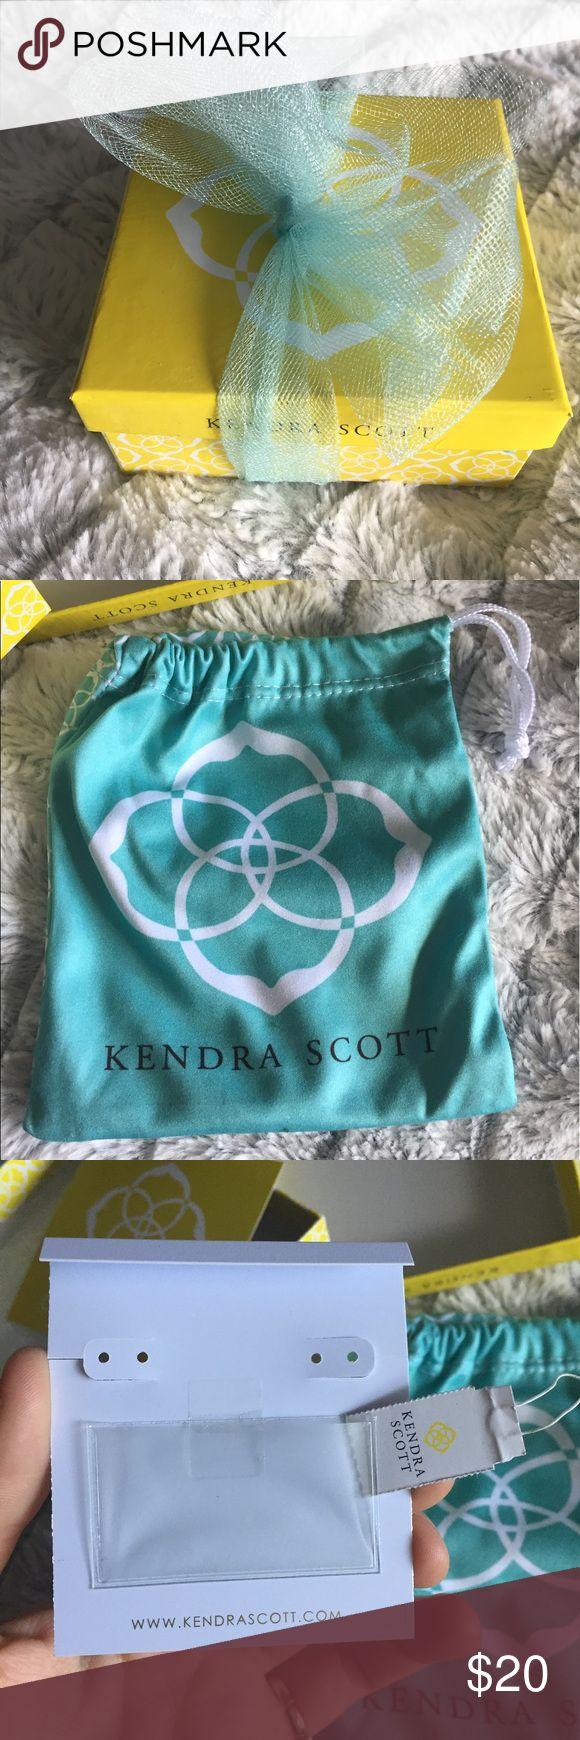 NWT Kendra Scott jewelry box package bag Comes with all that's pictured ! :) Kendra Scott Jewelry